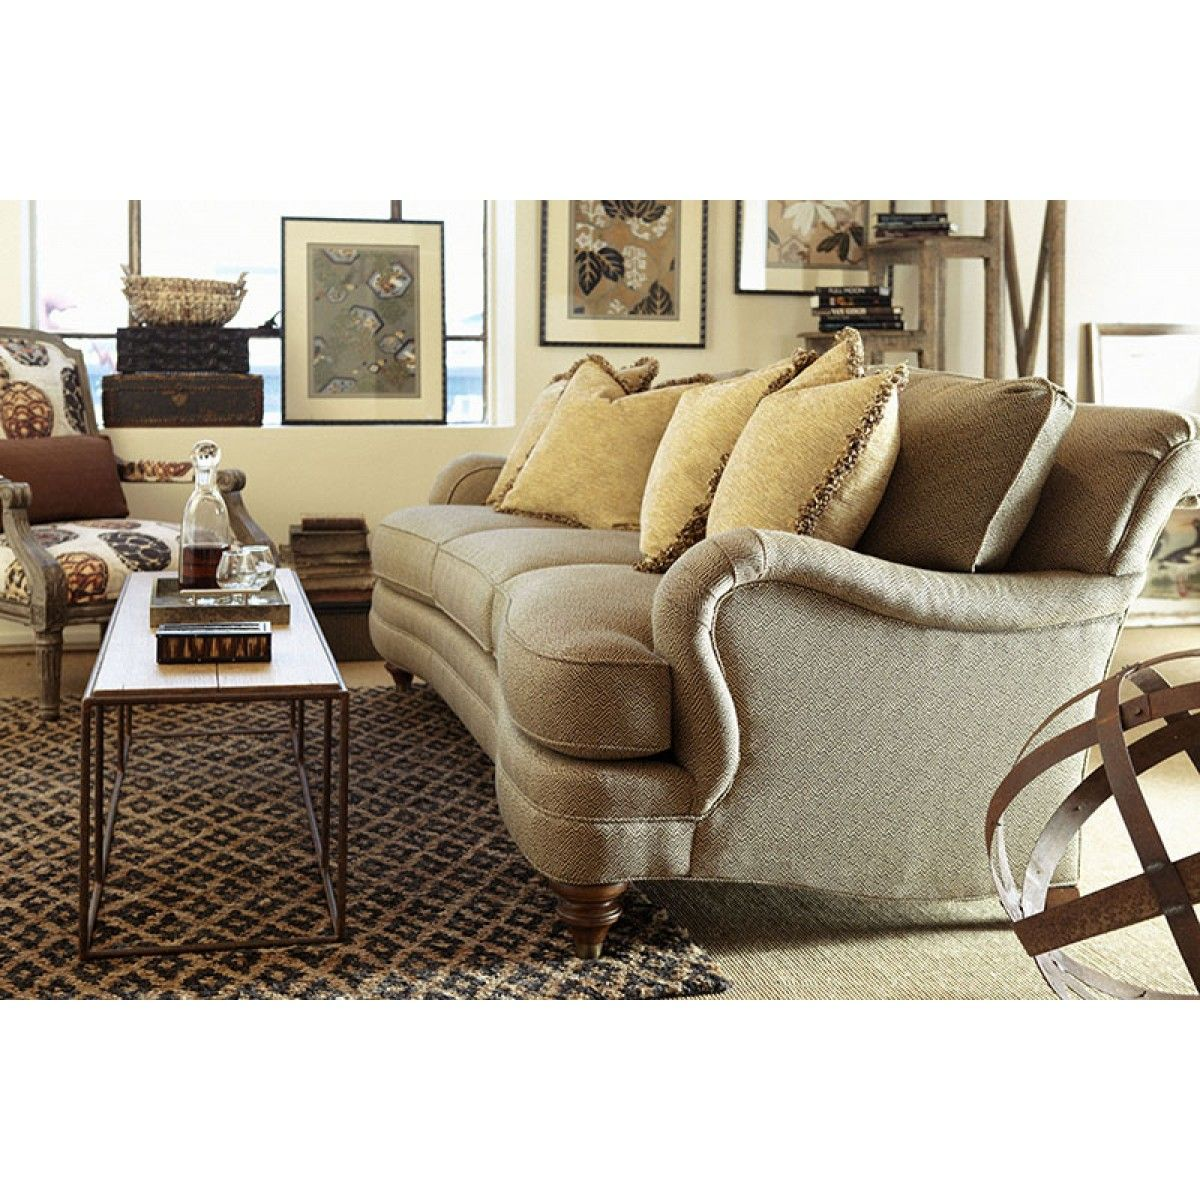 Century Kent Sofa Furniture, Deep sofa, Sofa